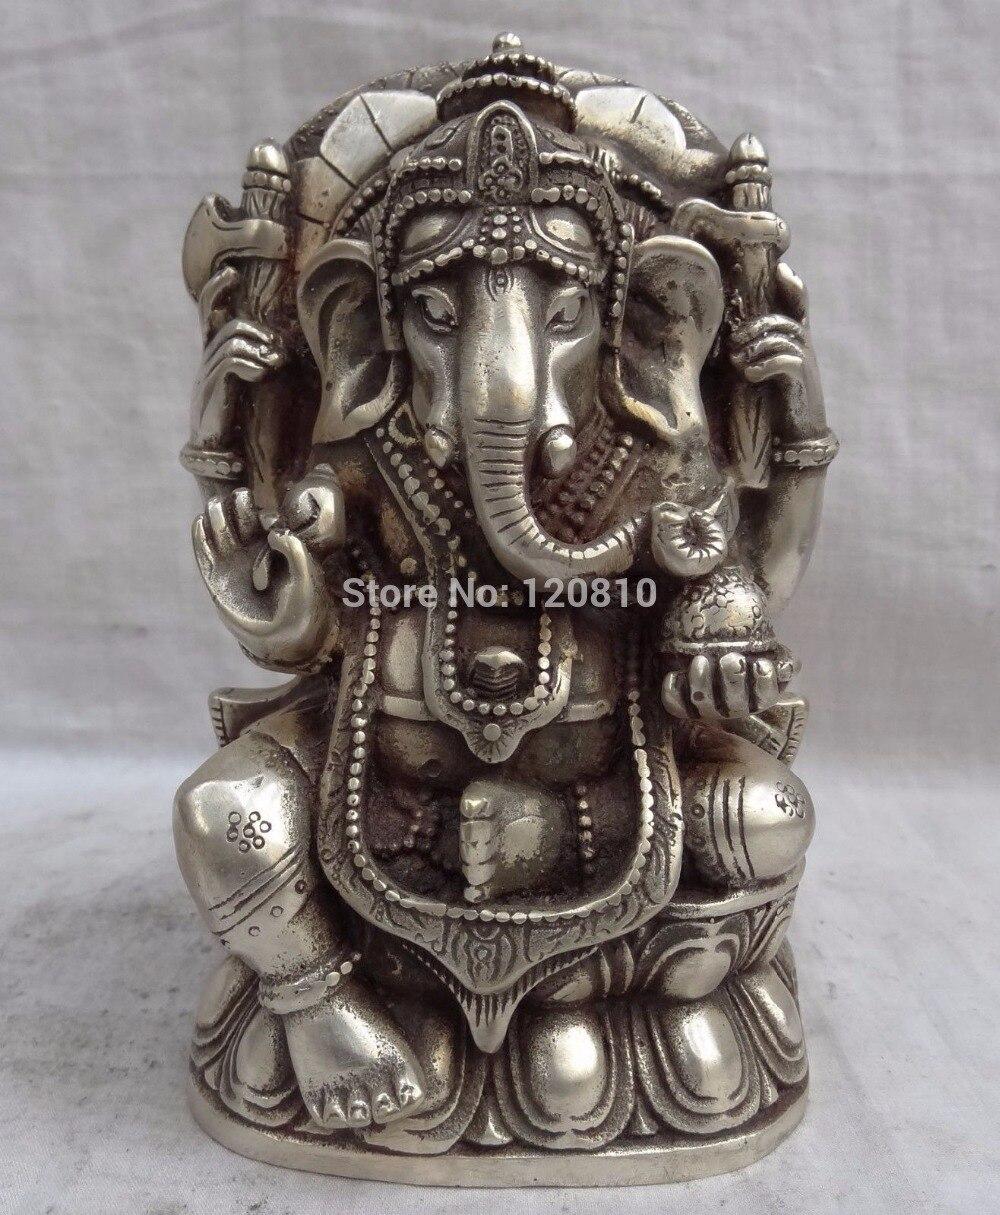 6600020 Tibet argent Lotus 4 bras Ganapati Ganesh seigneur Ganesha bouddha souris Statue